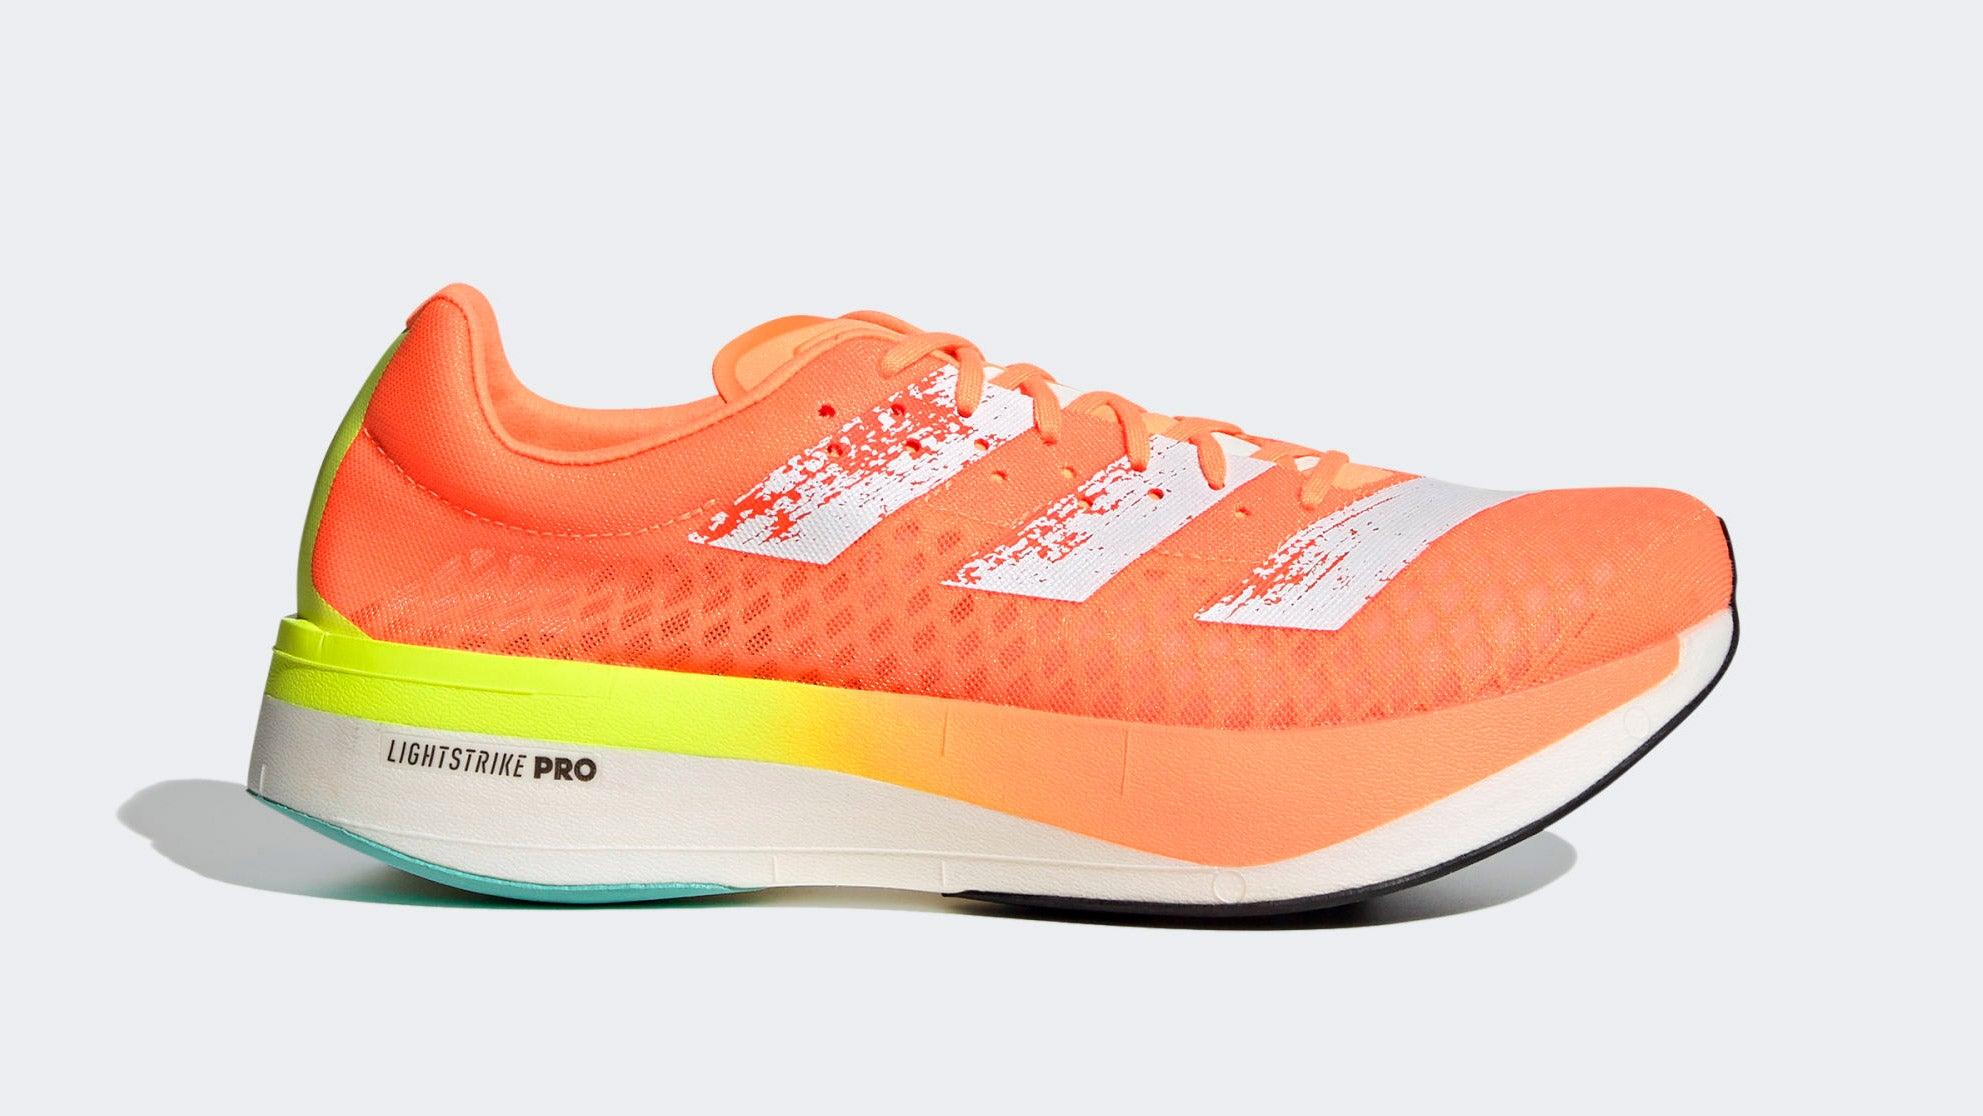 Orange and white Adidas Adizero Adios Pro